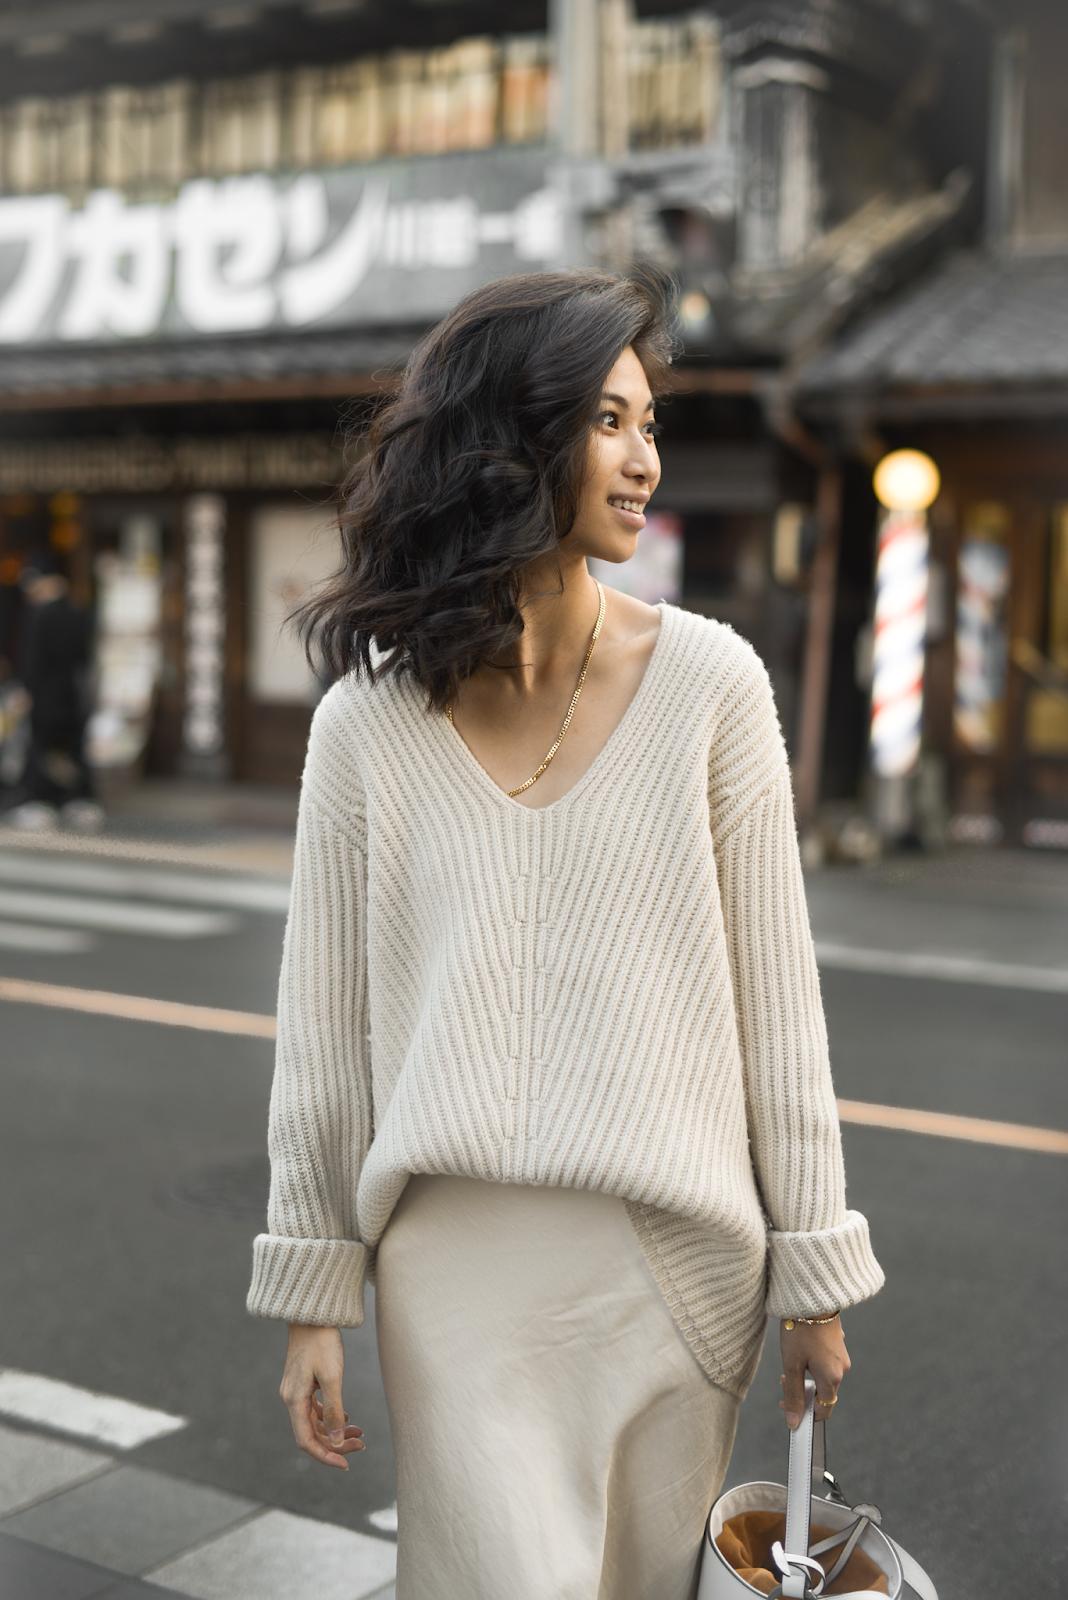 bda3e38a7 Long White Skirt Outfit Ideas | Huston Fislar Photography